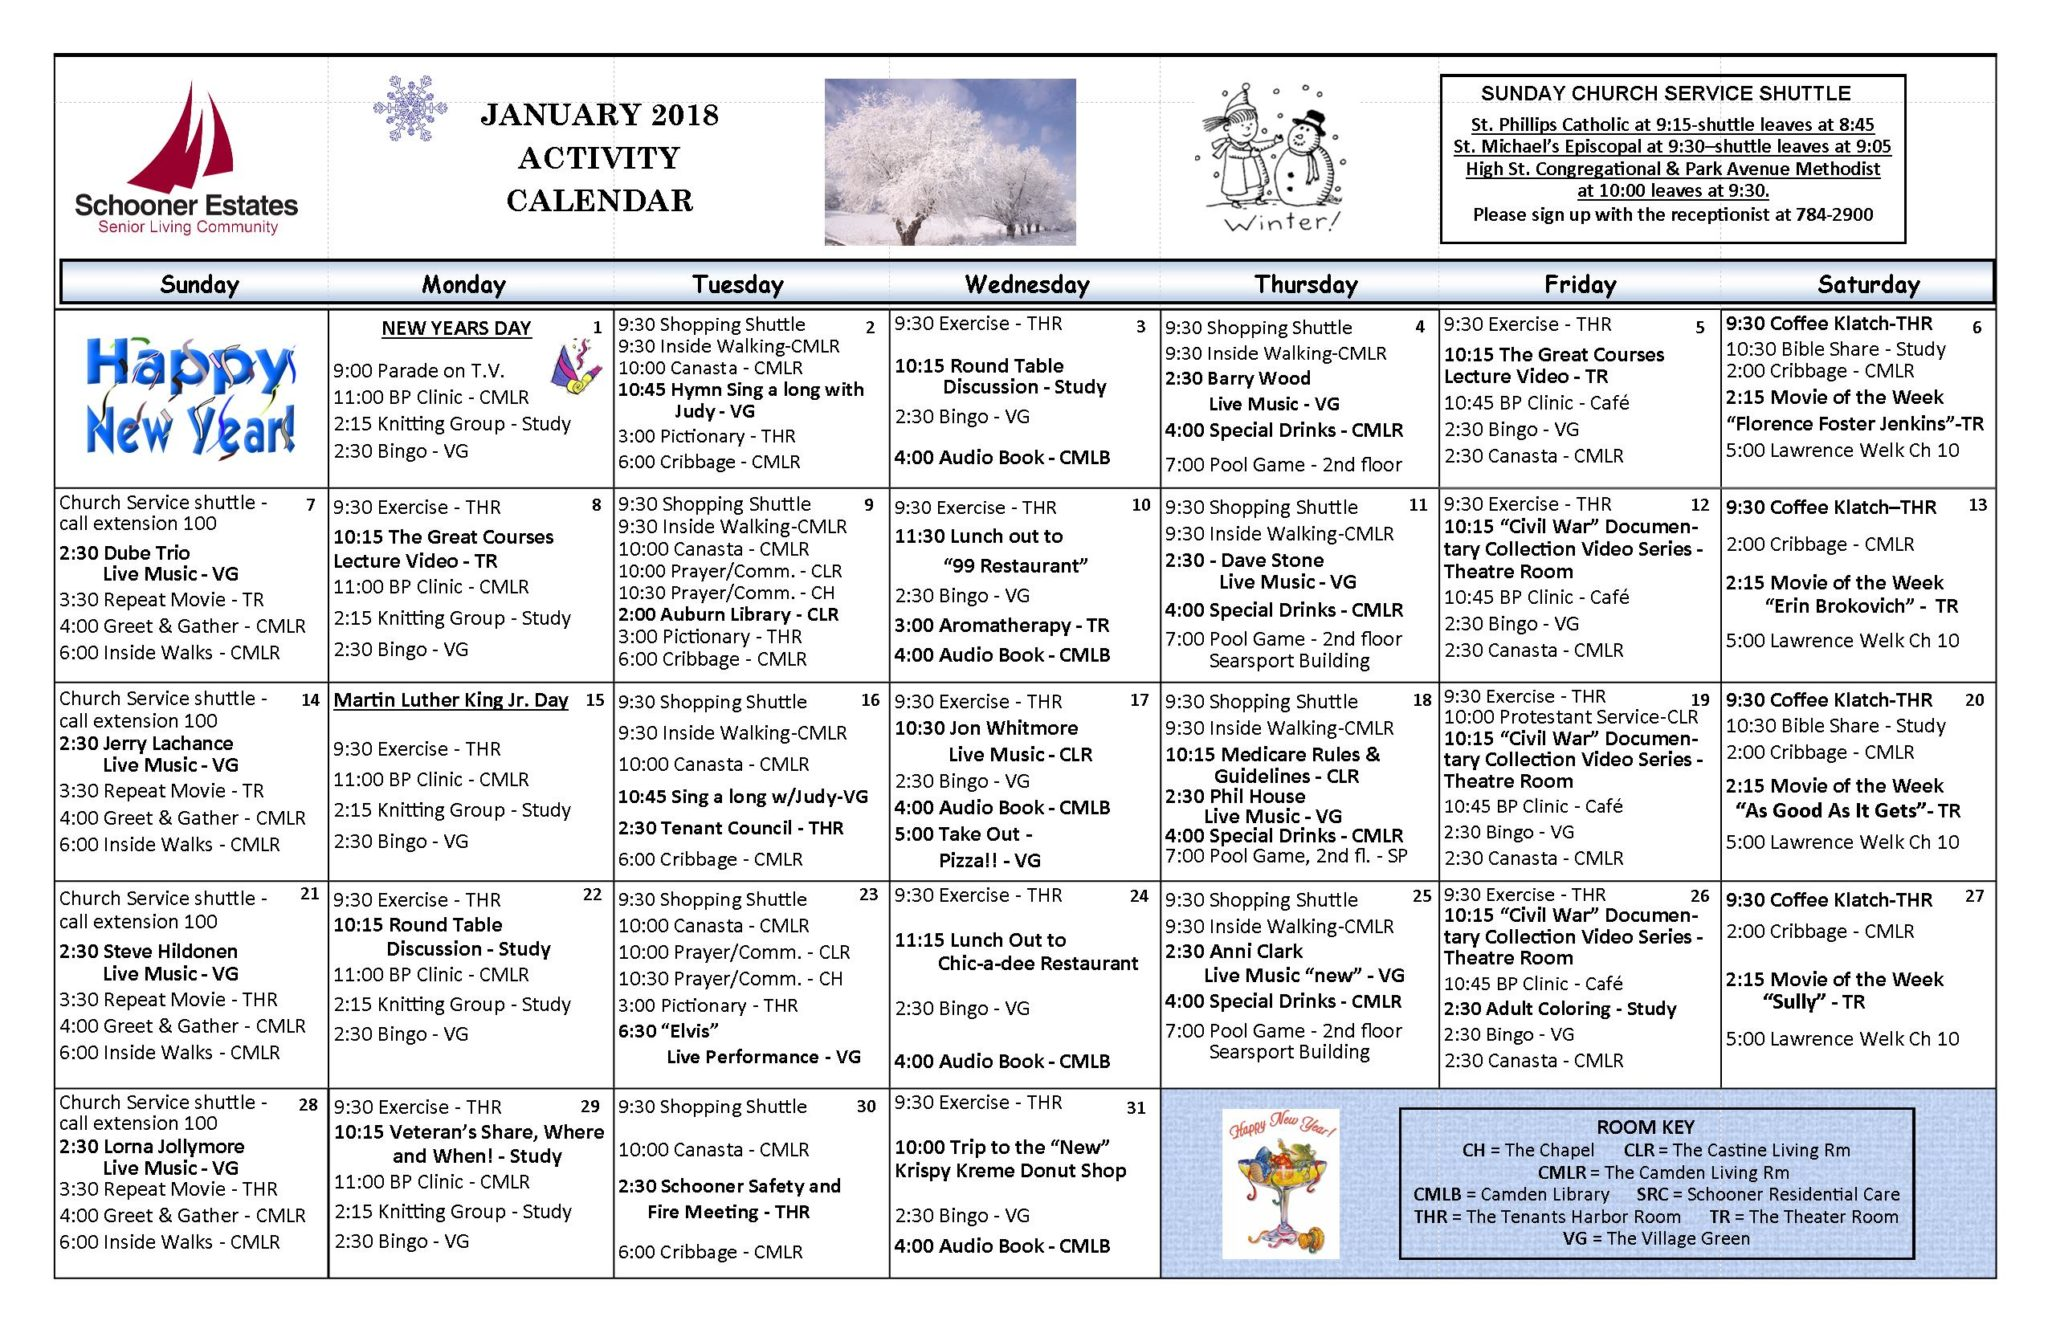 Calendar Activities 2018 : January schooner estates activity calendars